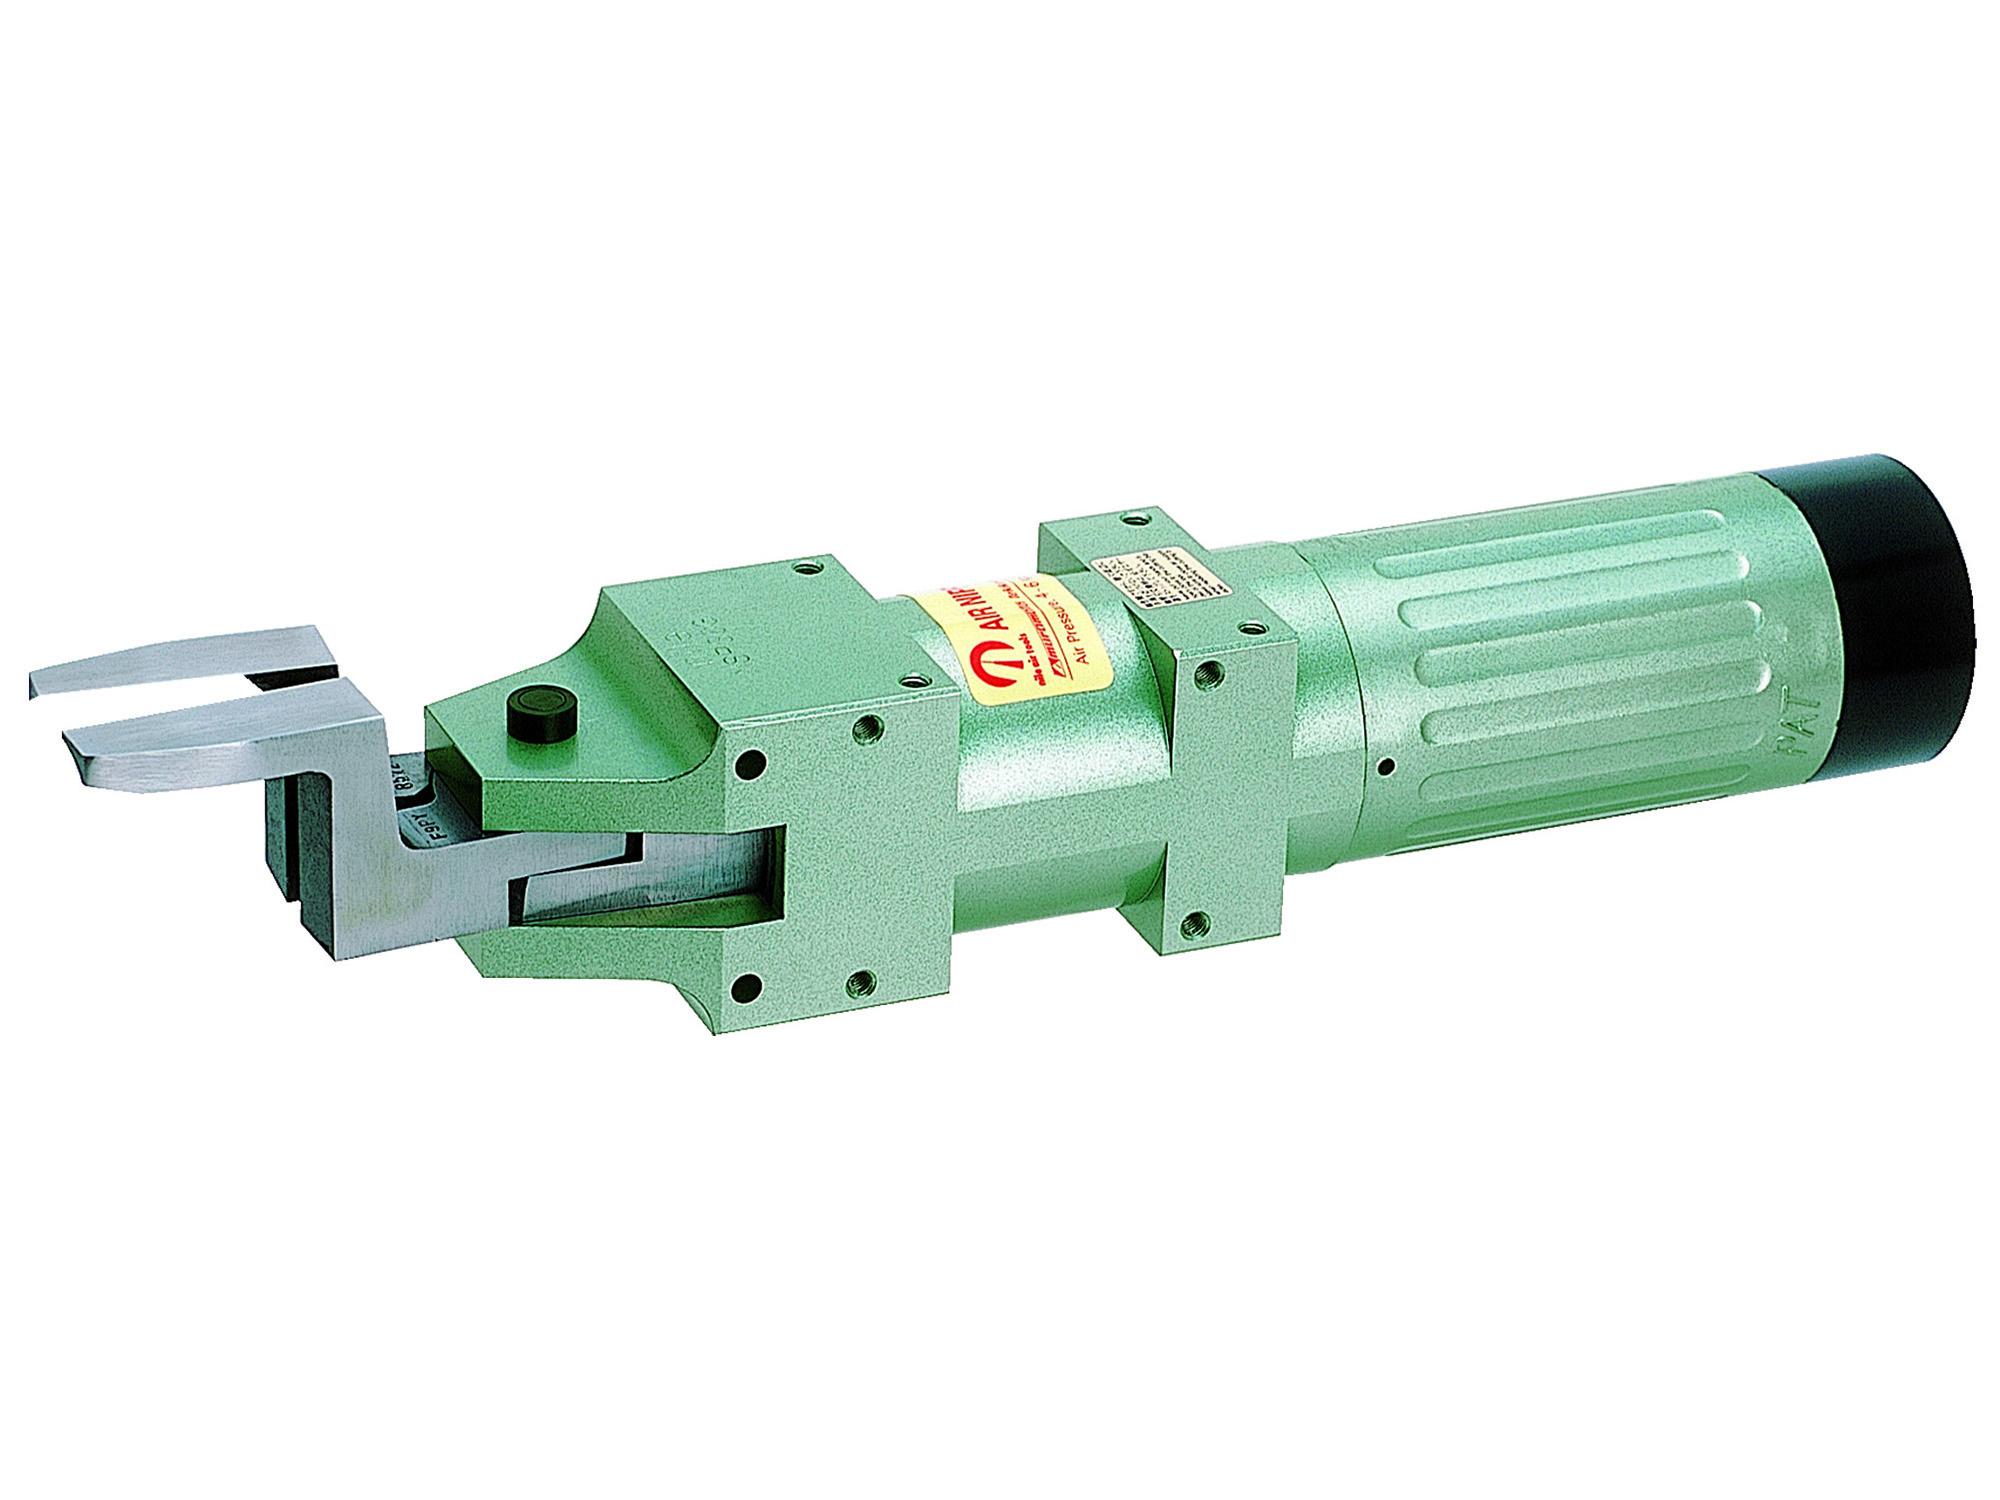 MSP-G型 機械取付式角型エアーニッパ 増圧タイプ